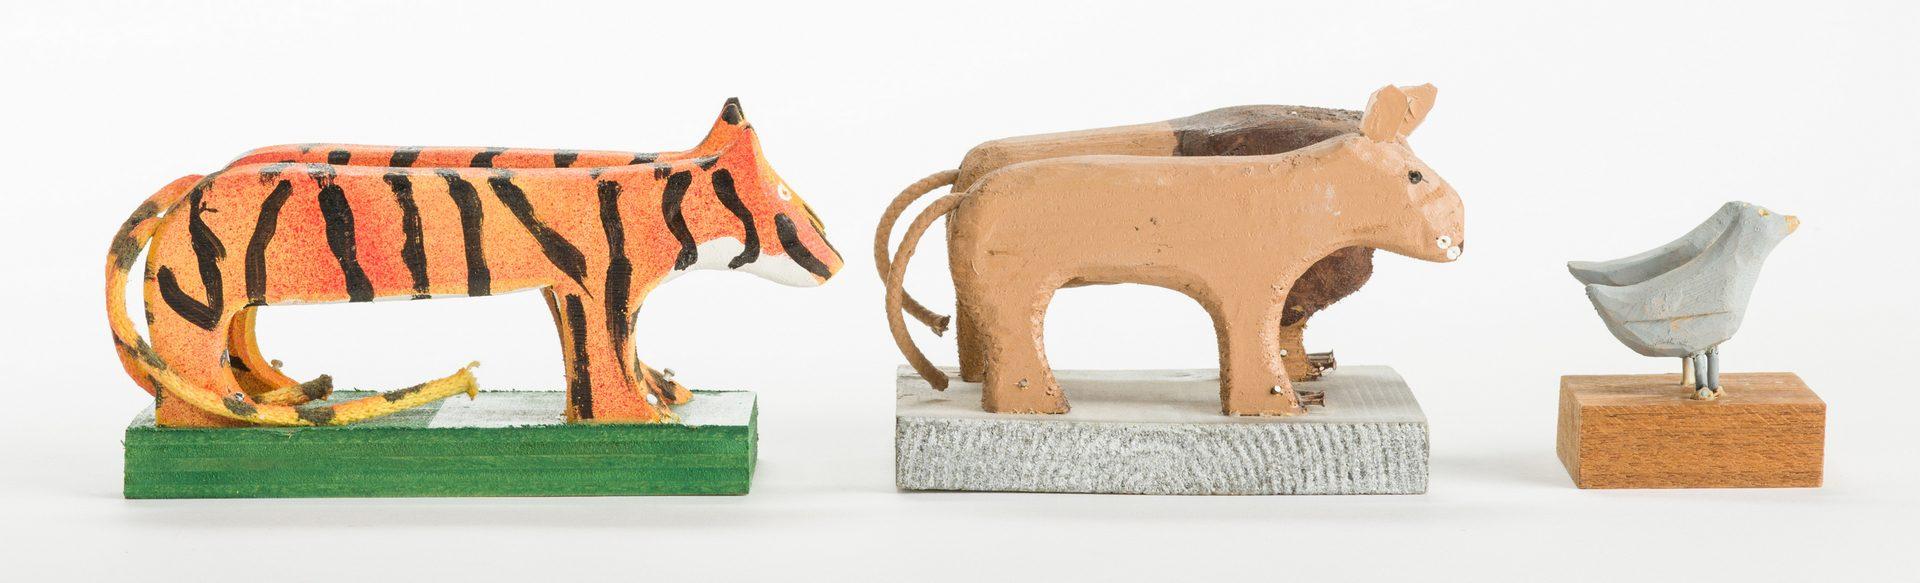 Lot 359: Braxton Ponder Carvings, Noah's Ark